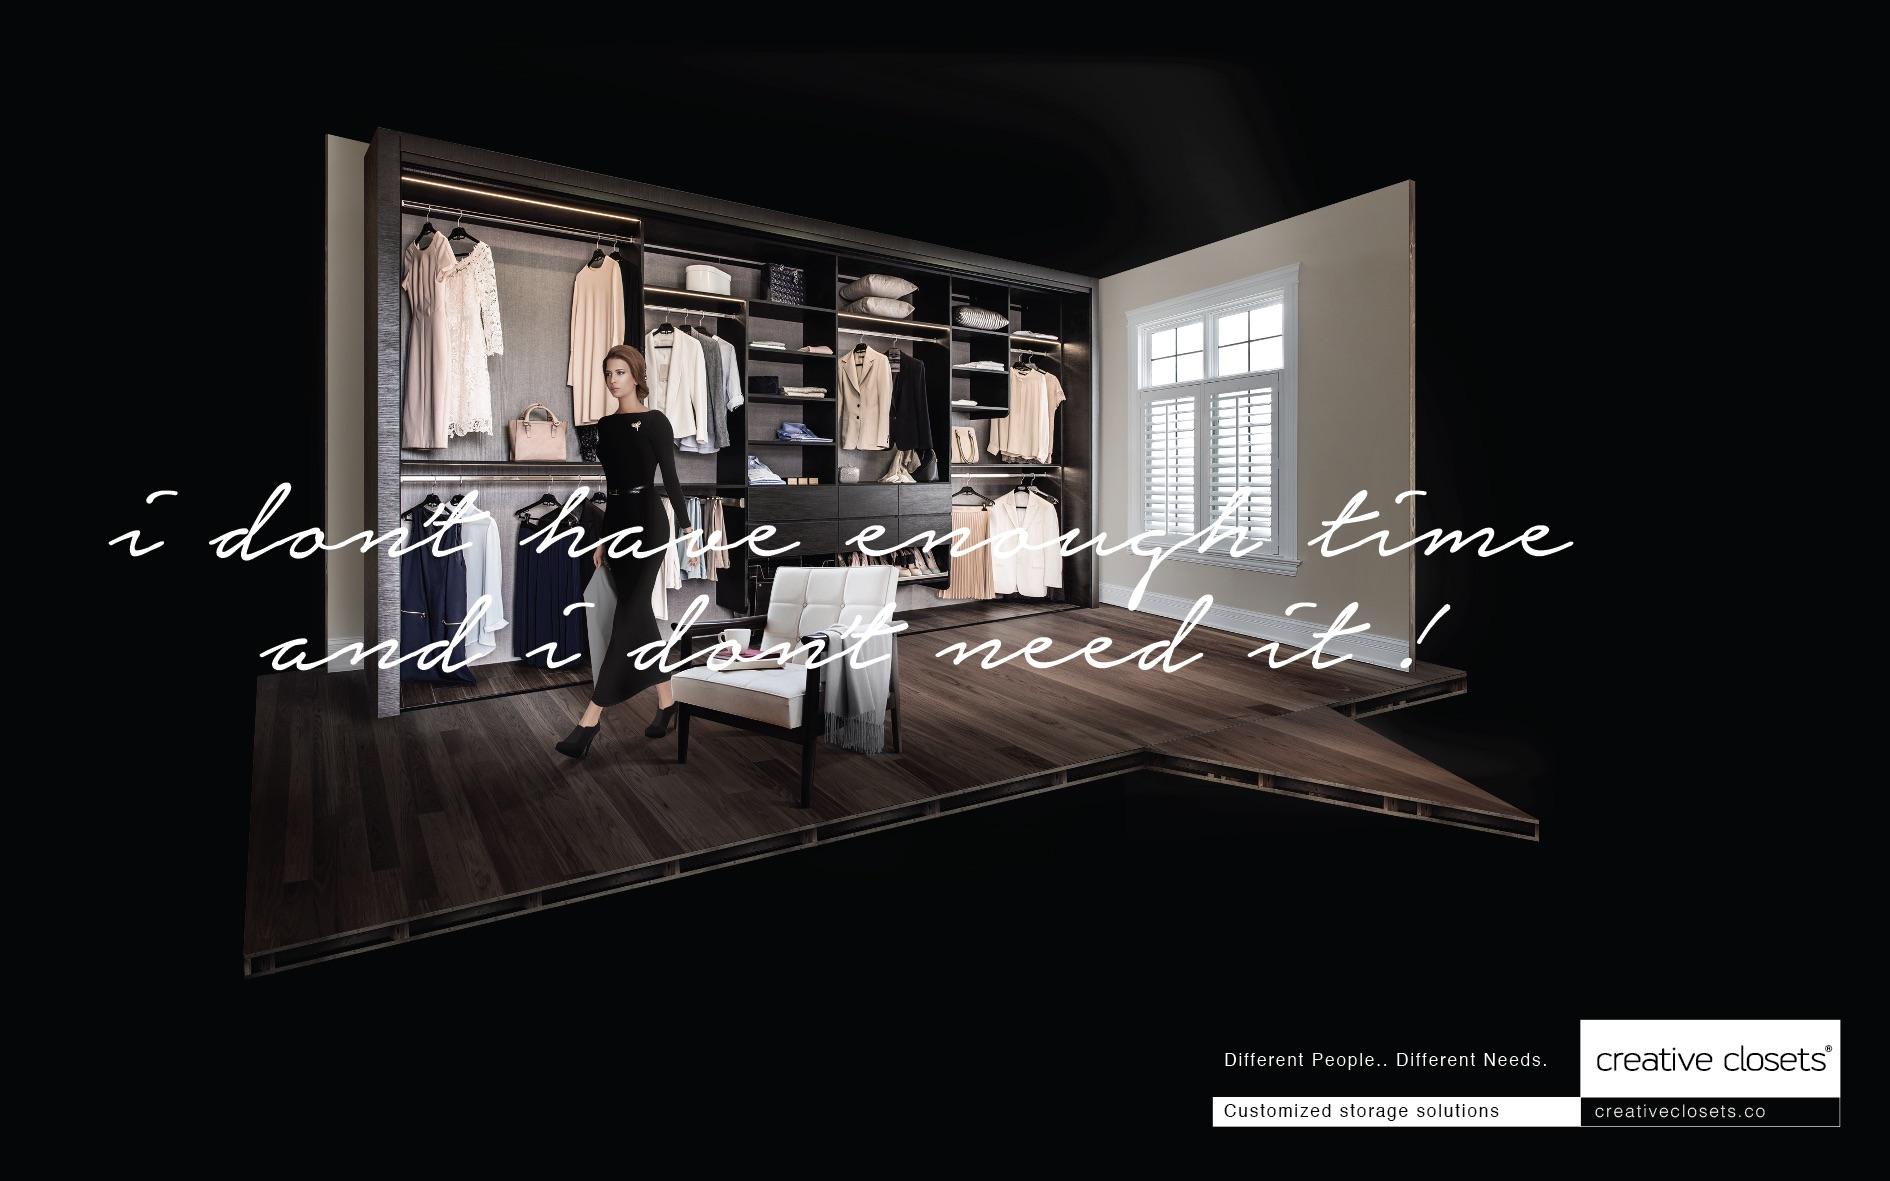 Creative Closets Print Ad   Customized Storage